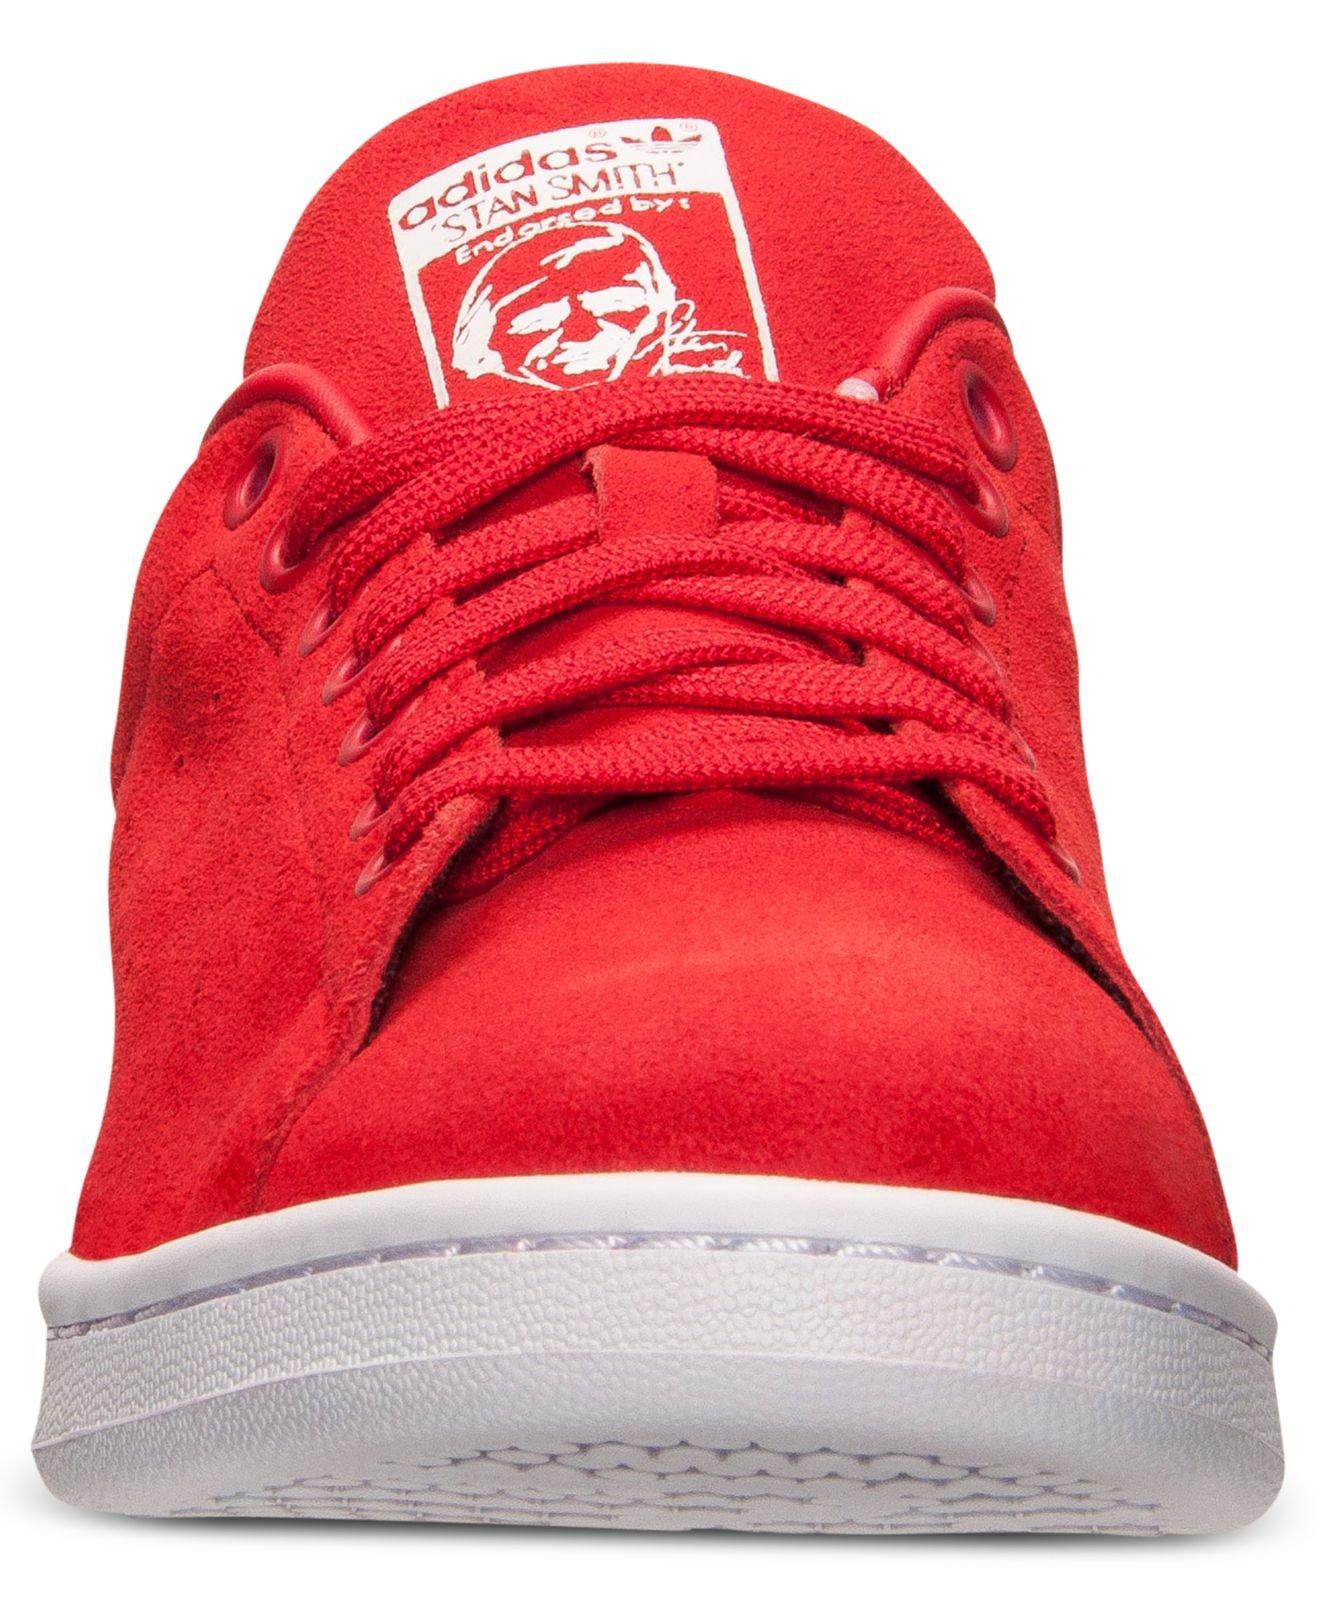 Adidas Originals Stan Smith Suede Red White